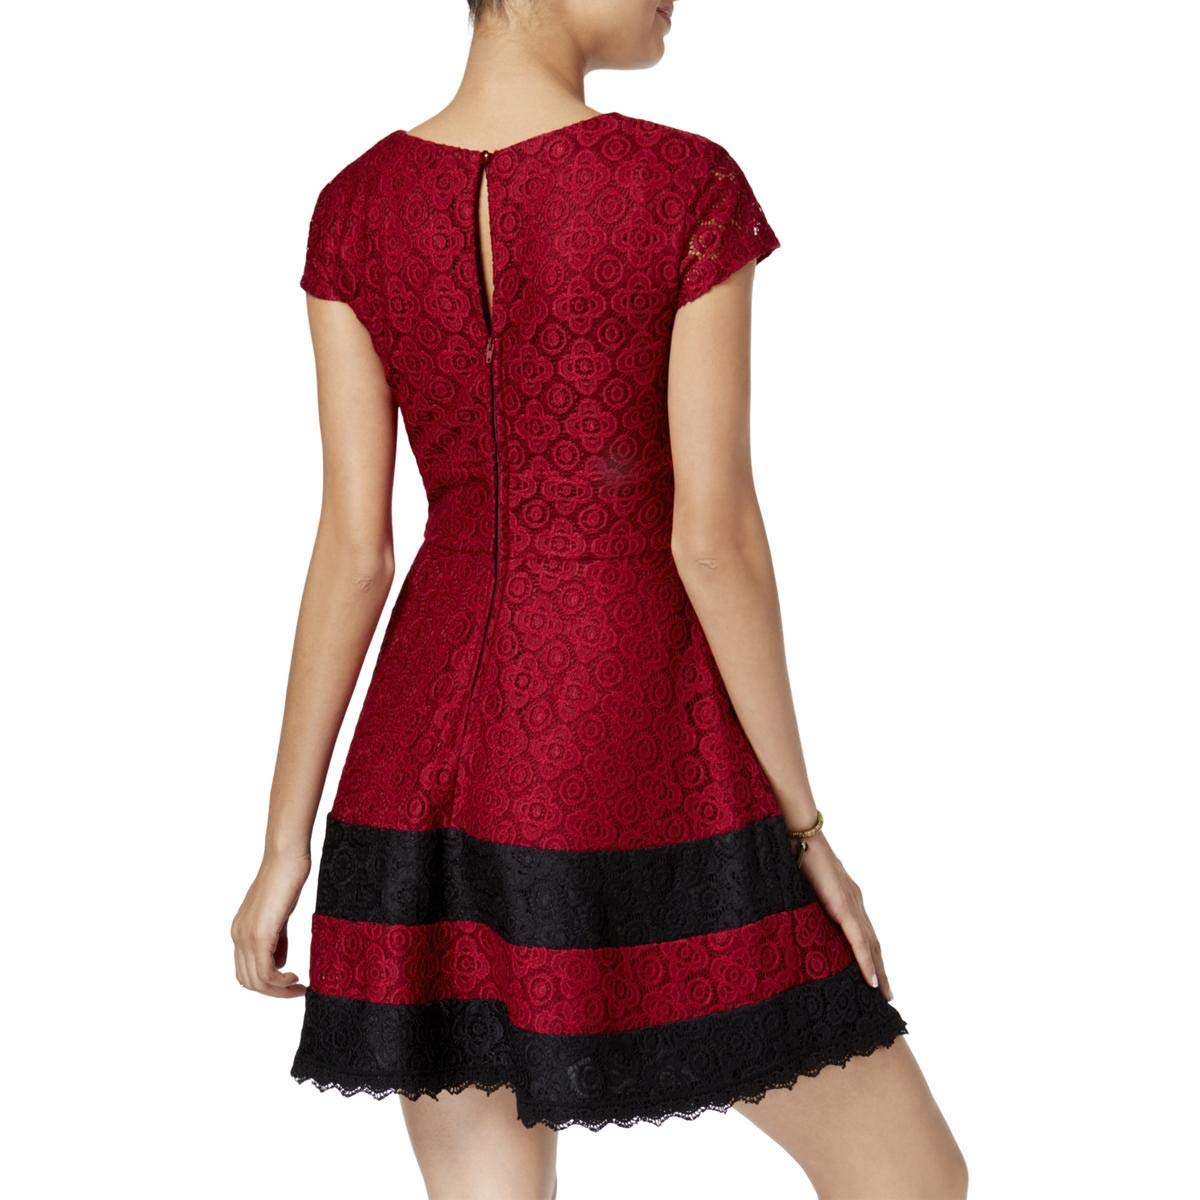 c91ed50f3 Amazon.com: Teeze Me Womens Juniors Lace Mini Party Dress Red 1/2: Clothing